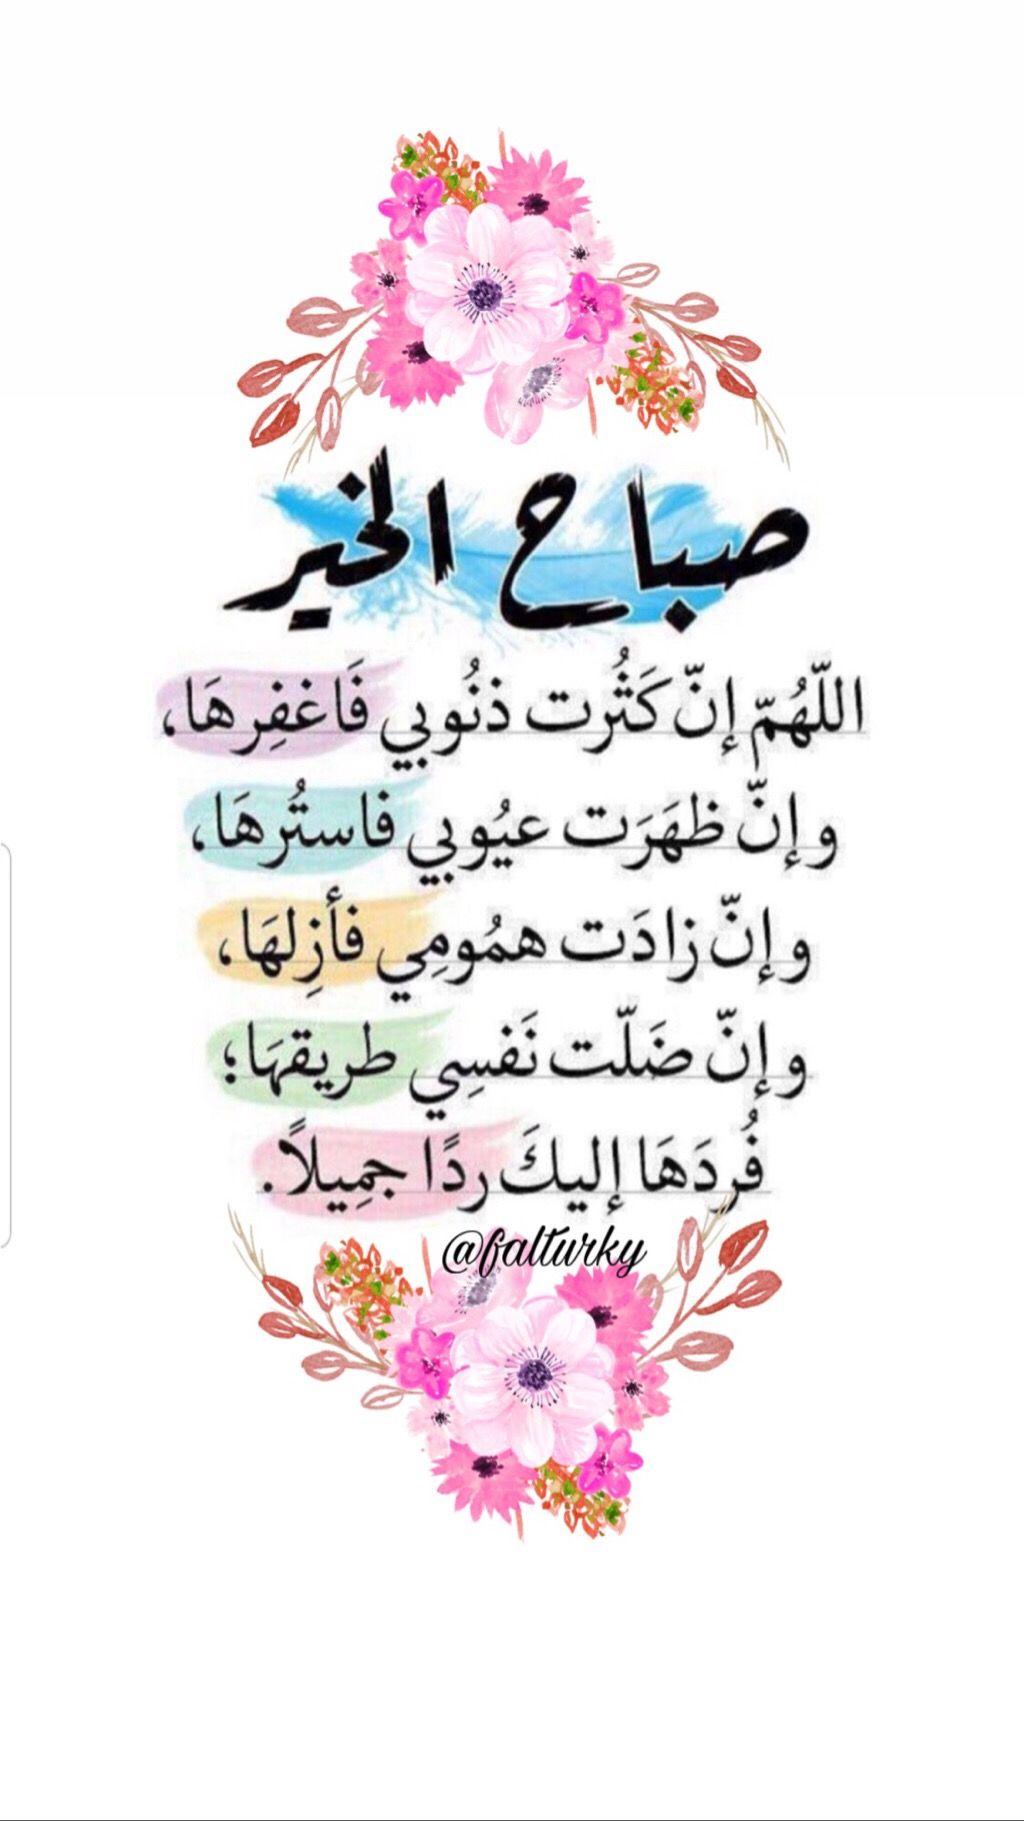 Pin By Madalya On صباحي بكم أجمل Morning Quotes Good Morning Messages Good Morning Arabic